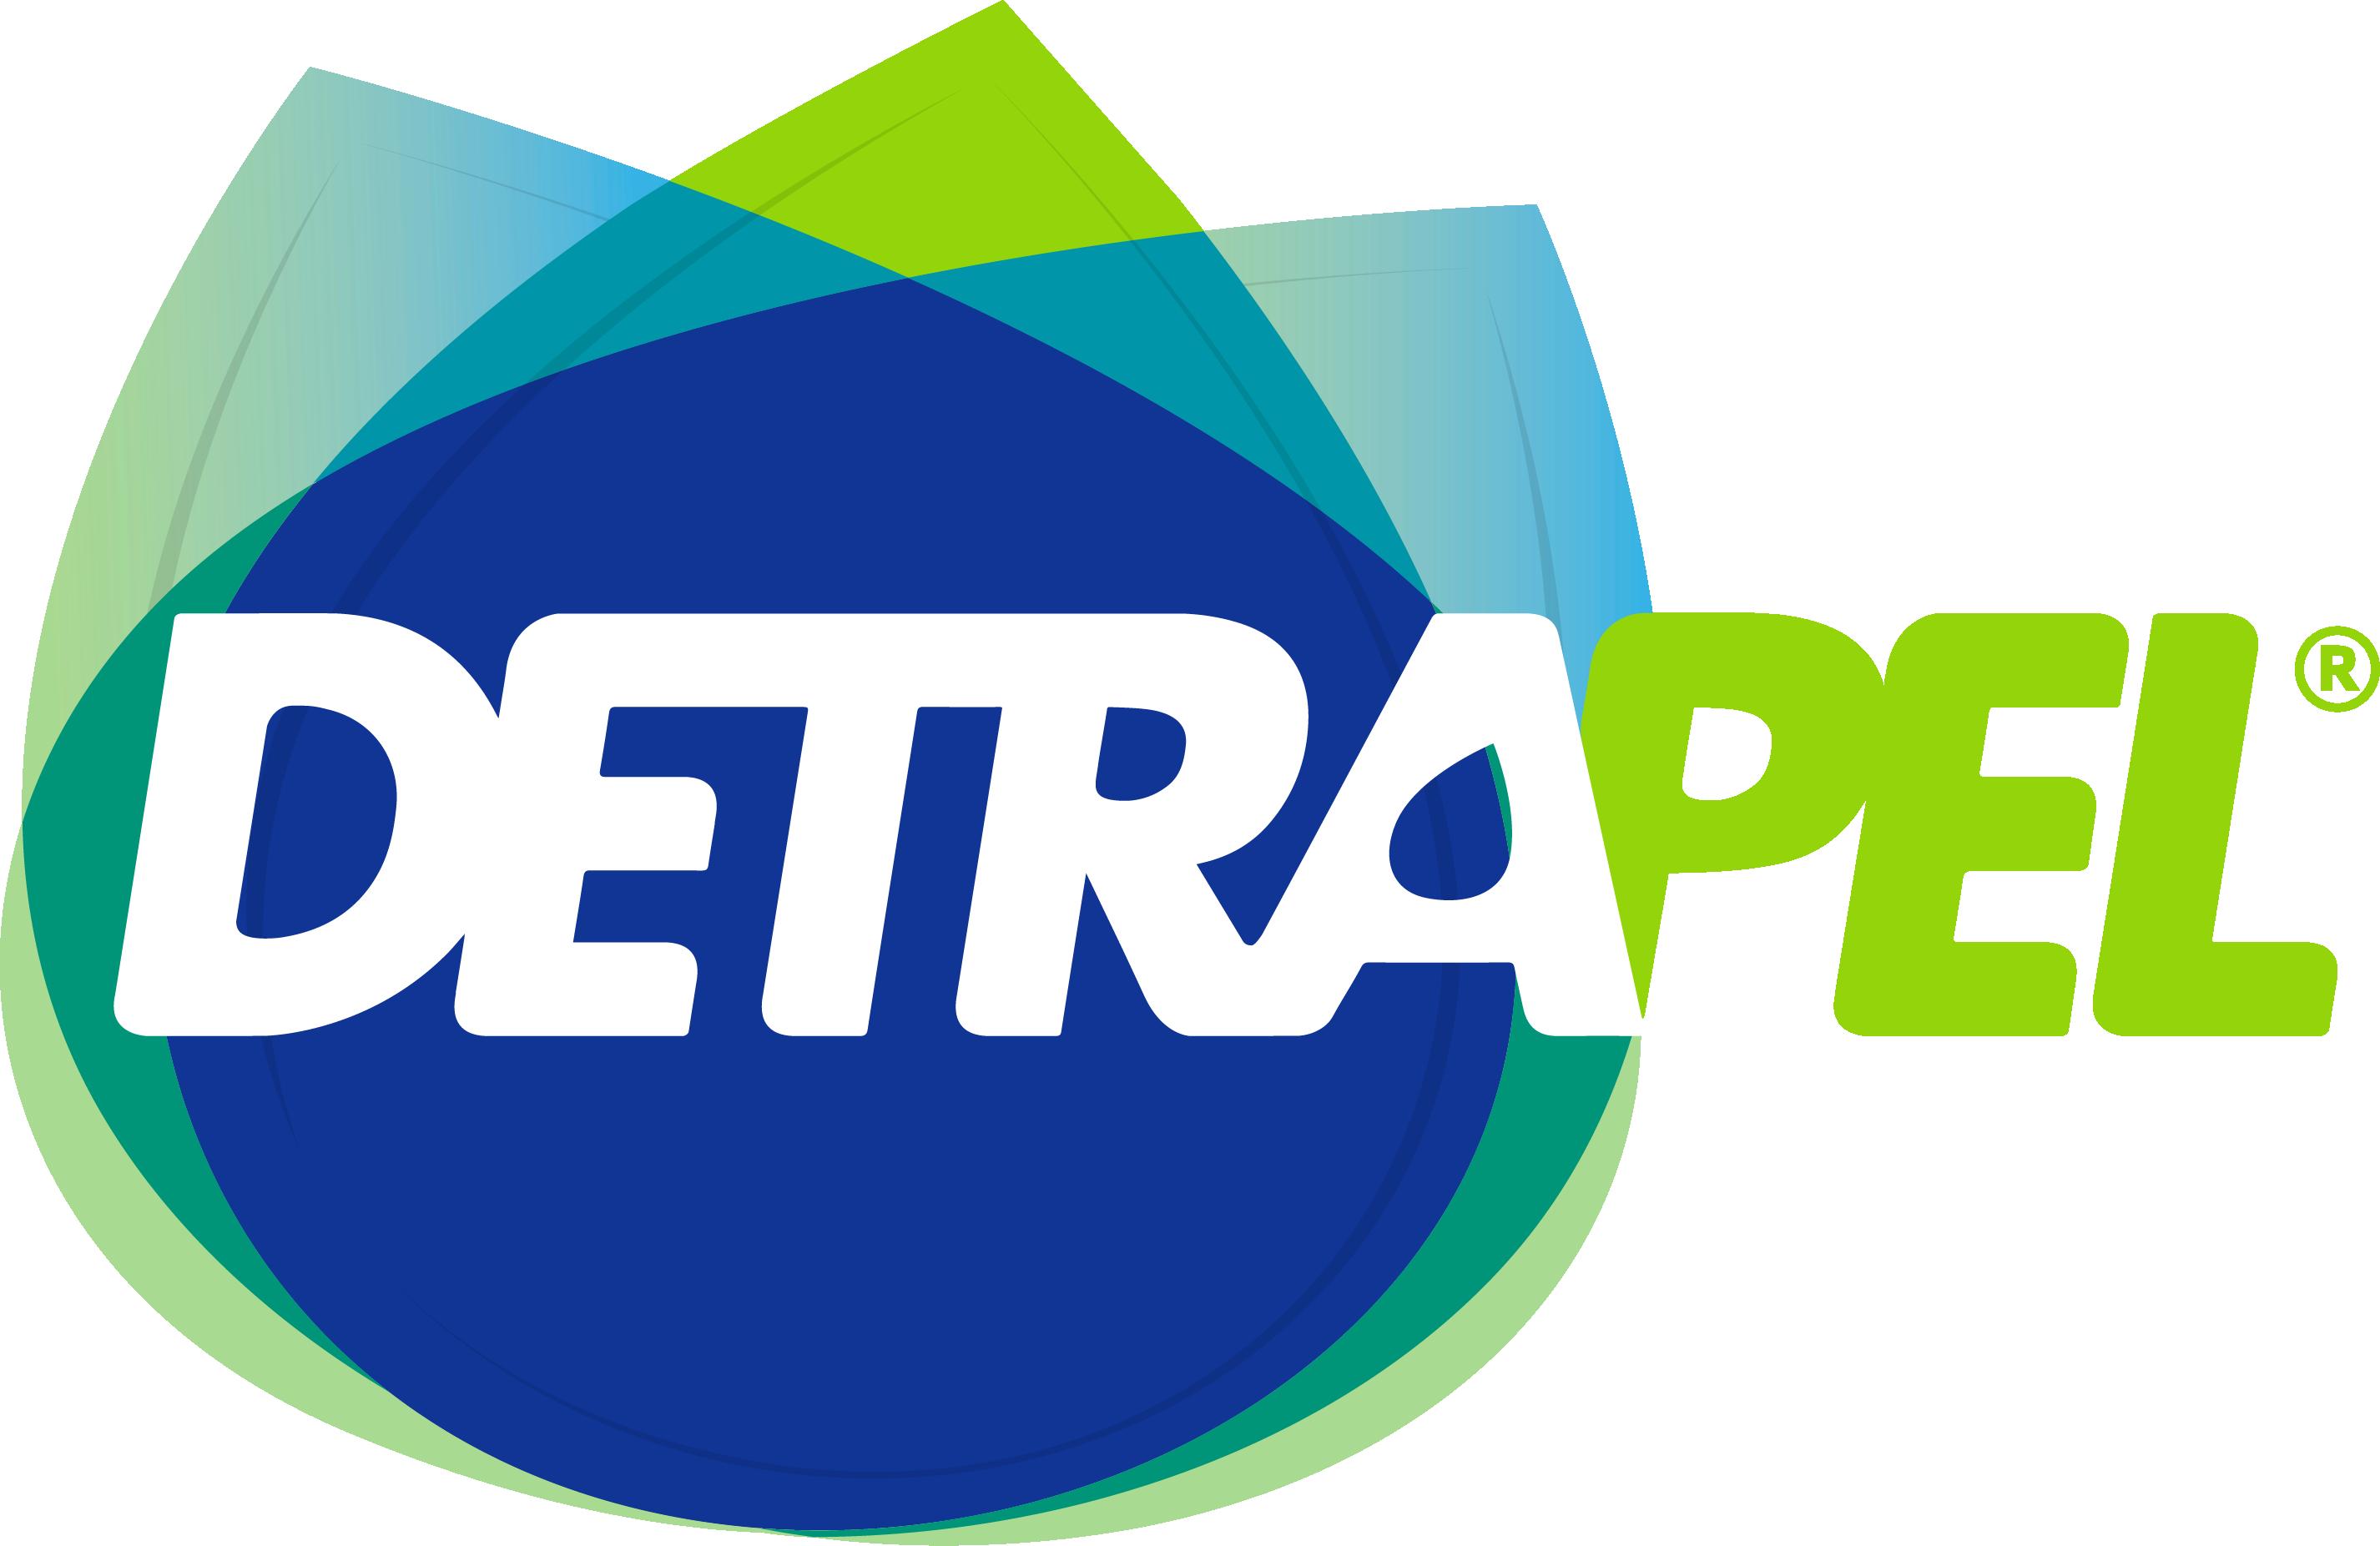 DetraPel|フッ素不使用 無害 アメリカで大人気の凄い超撥水スプレー